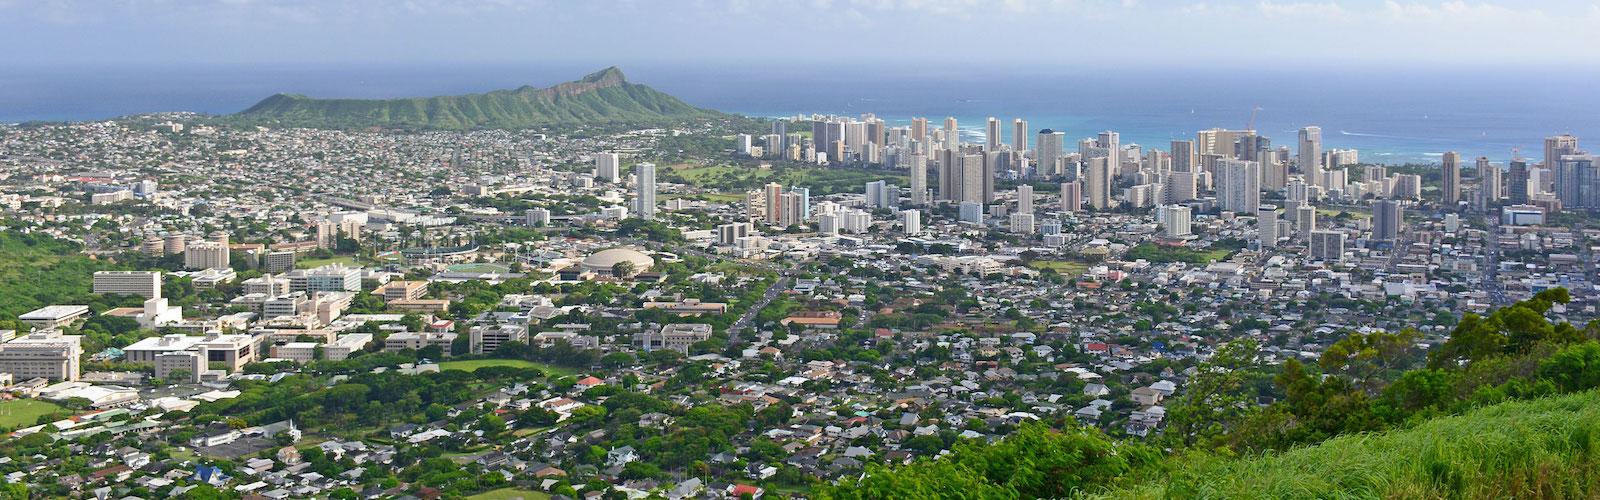 Tantalus Lookout, Oahu Scenic Lookouts, Hawaii